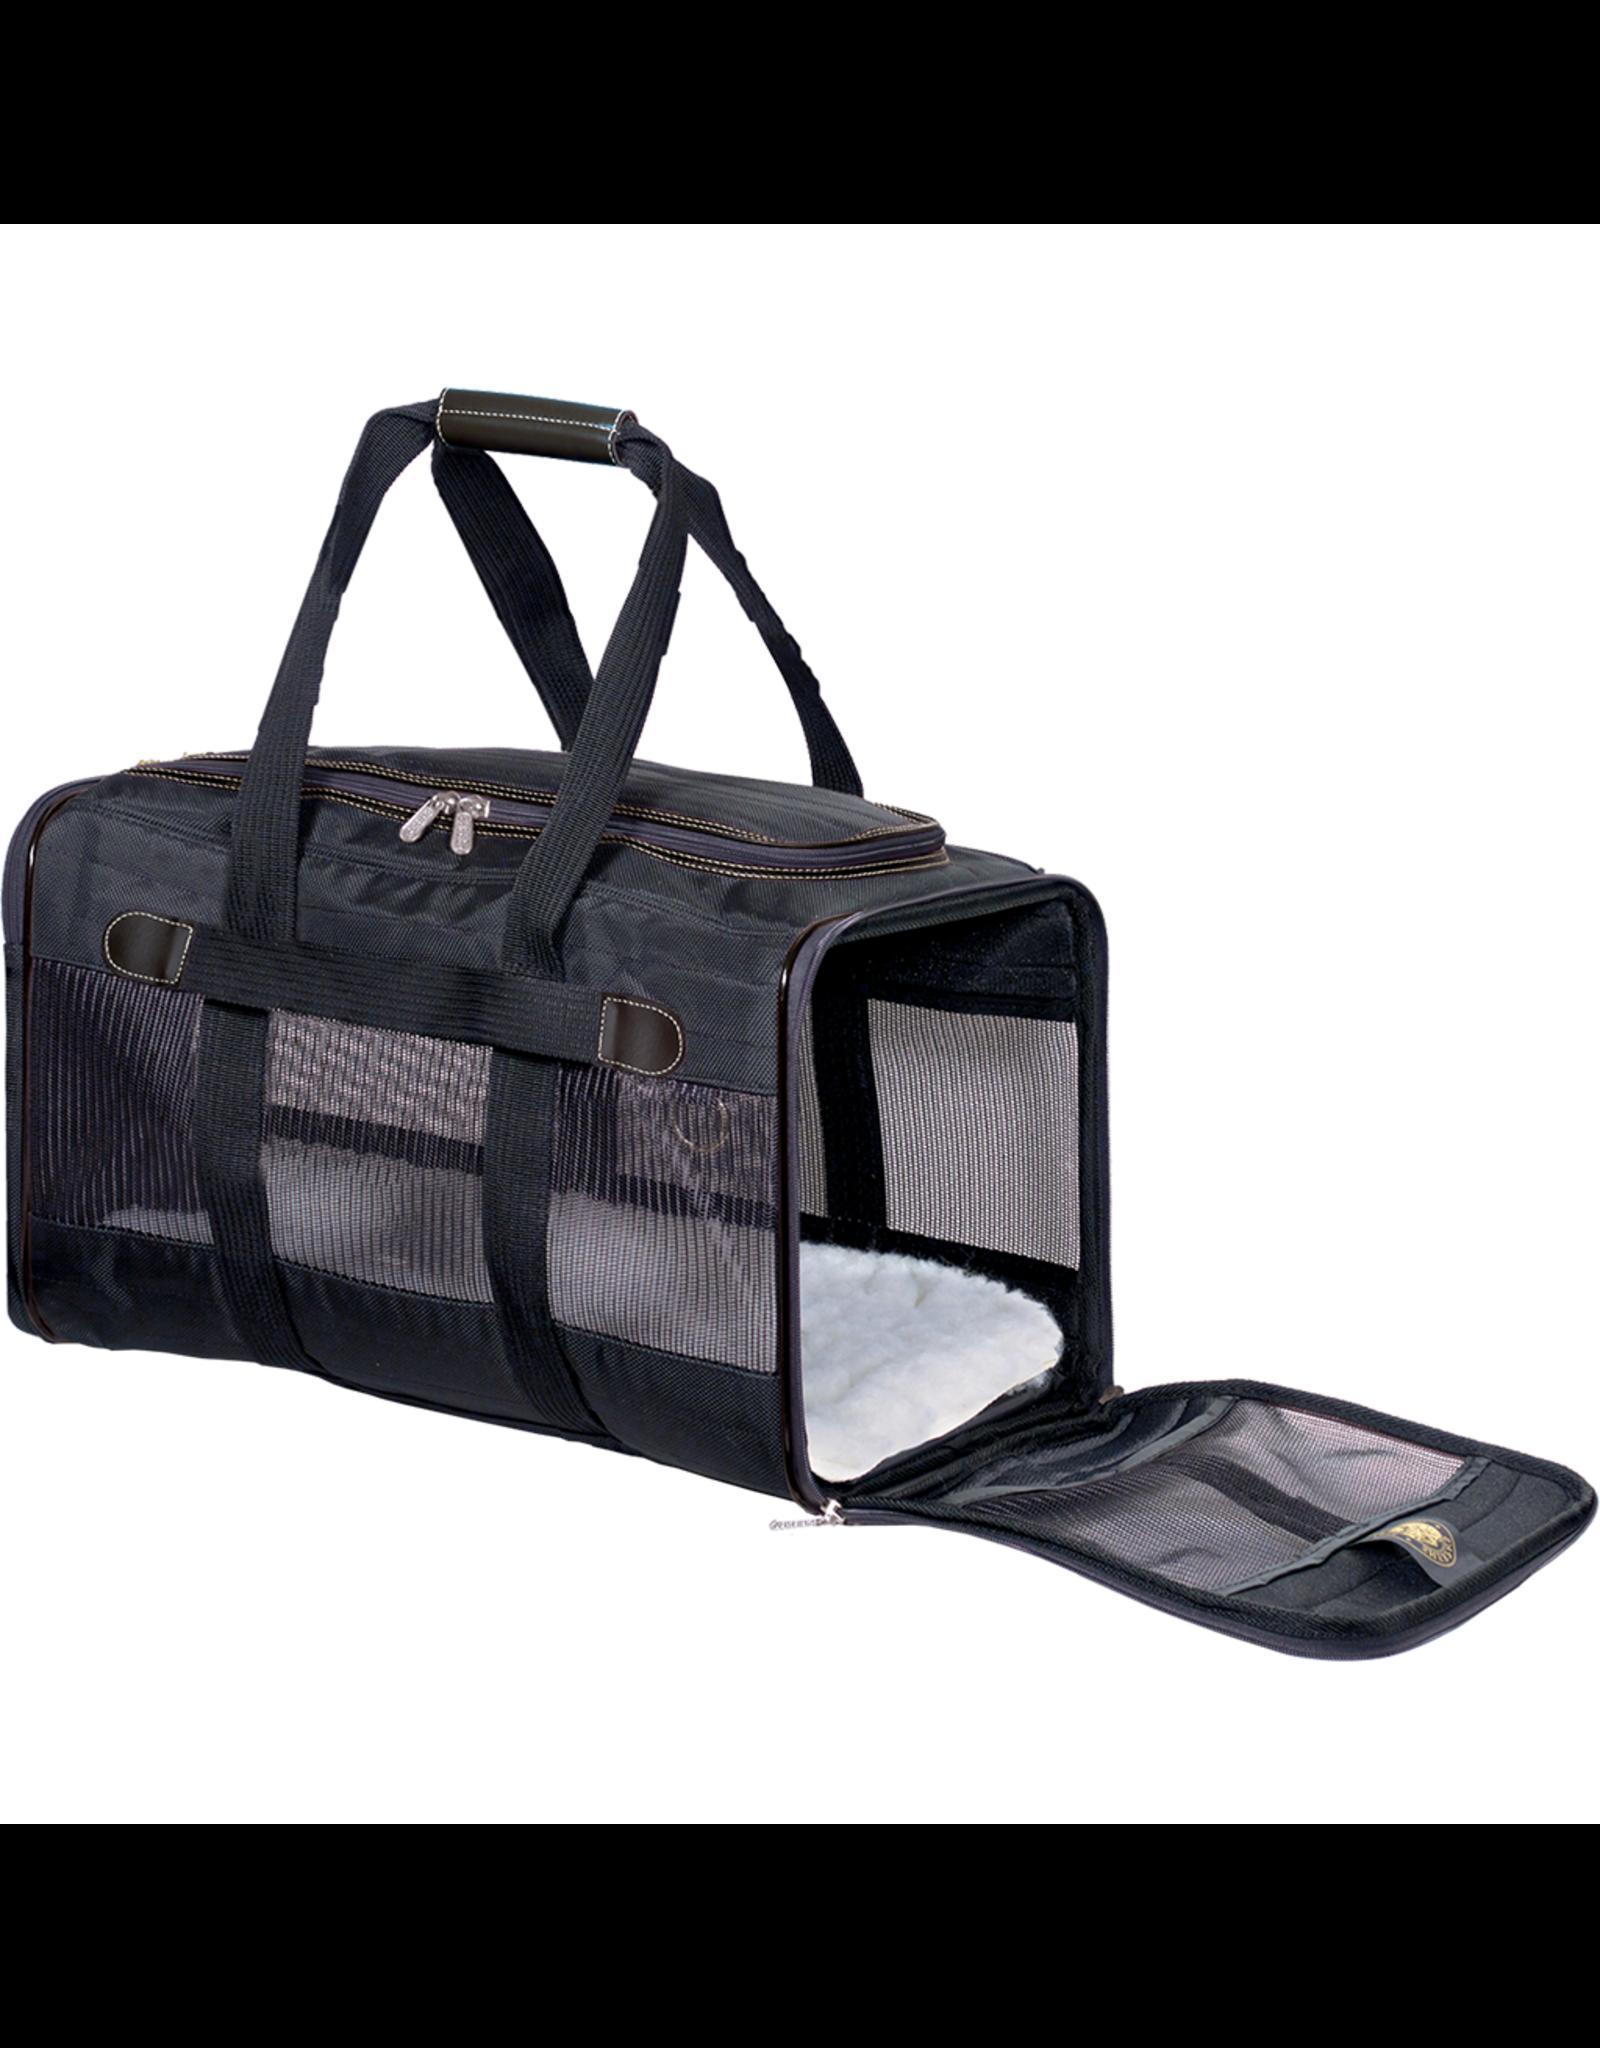 Sherpa Sherpa Original Deluxe Bag